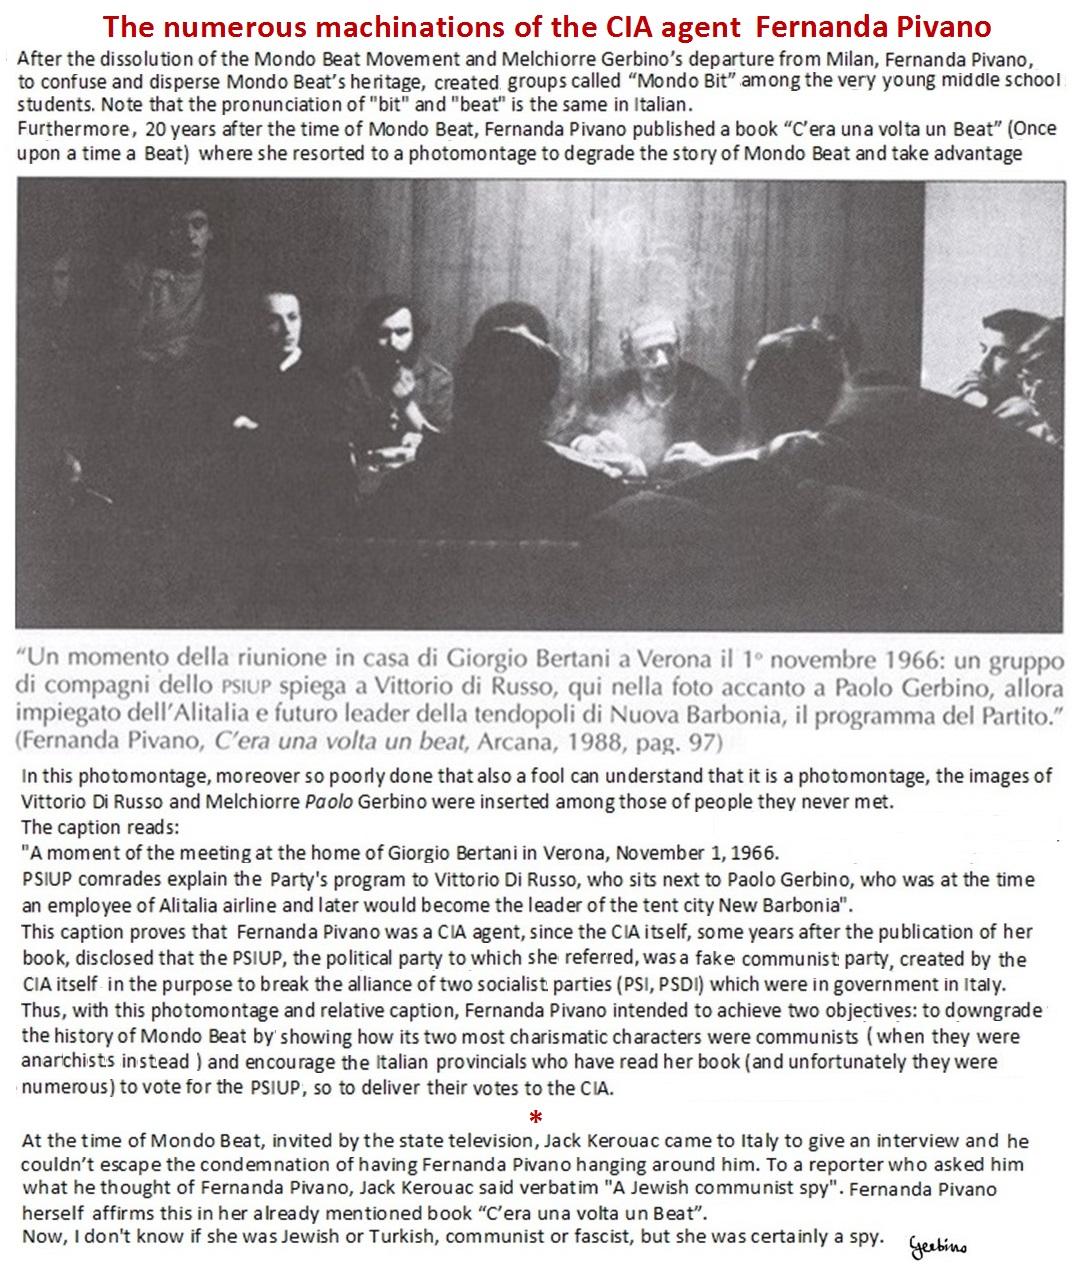 Jack Kerouacsaid of Fernanda Pivano 'a Jewish communist spy'